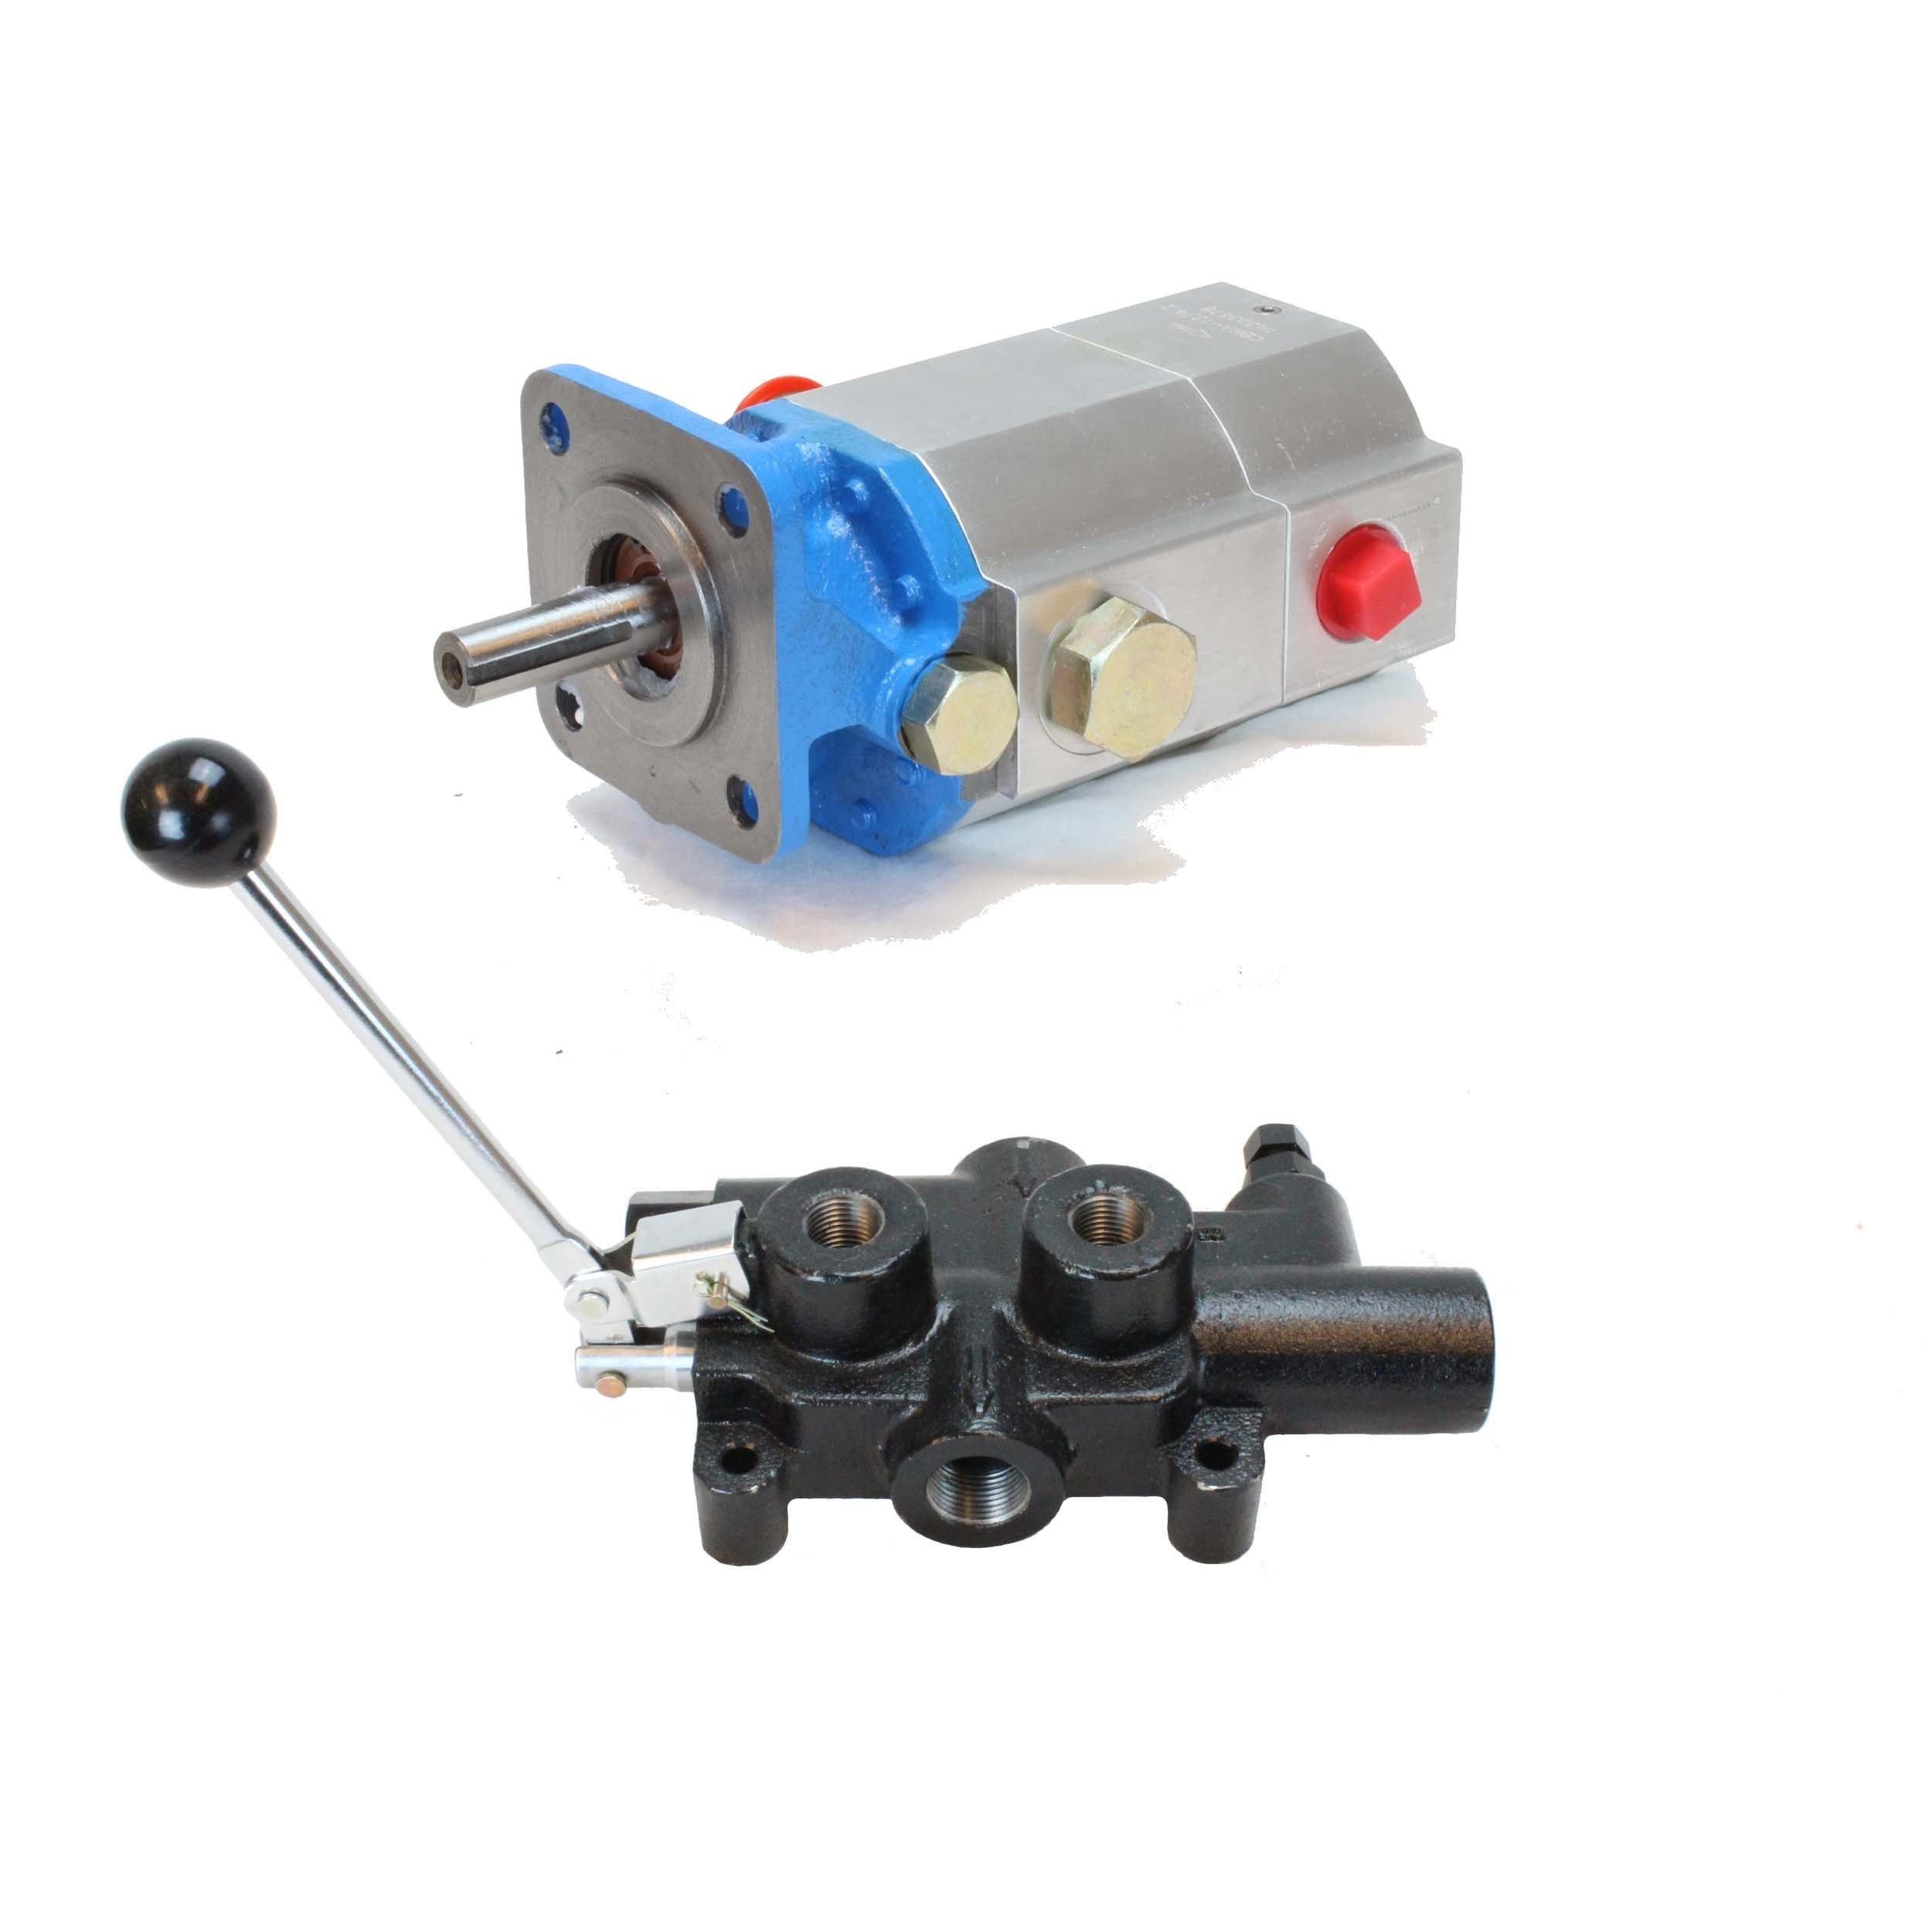 11 GPM GEAR PUMP & 25 GPM VALVE COMBO KIT [Combo-11-25-Combo-Kit]